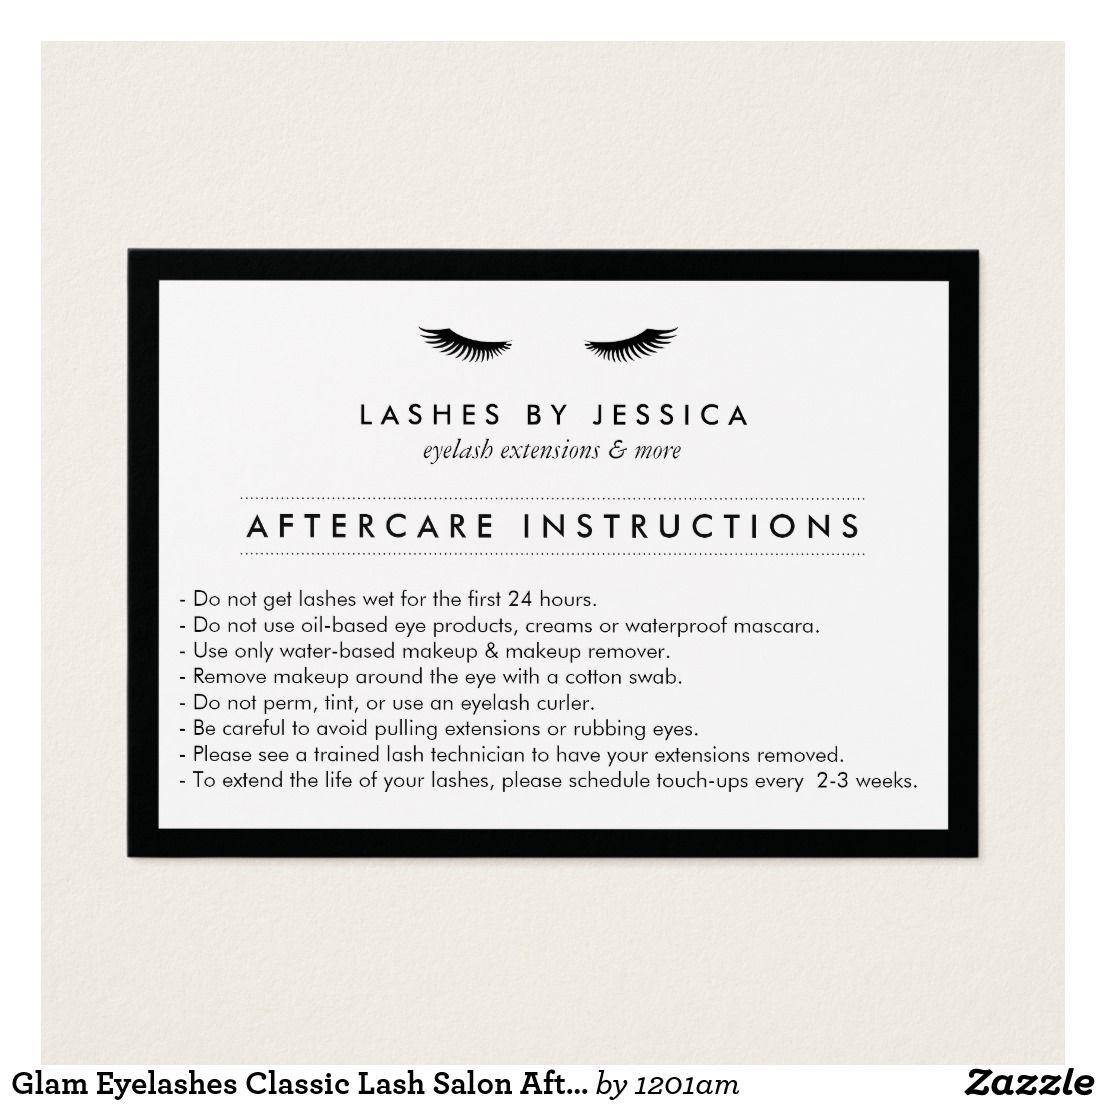 Glam Eyelashes Classic Lash Salon Aftercare Card My Home Studio